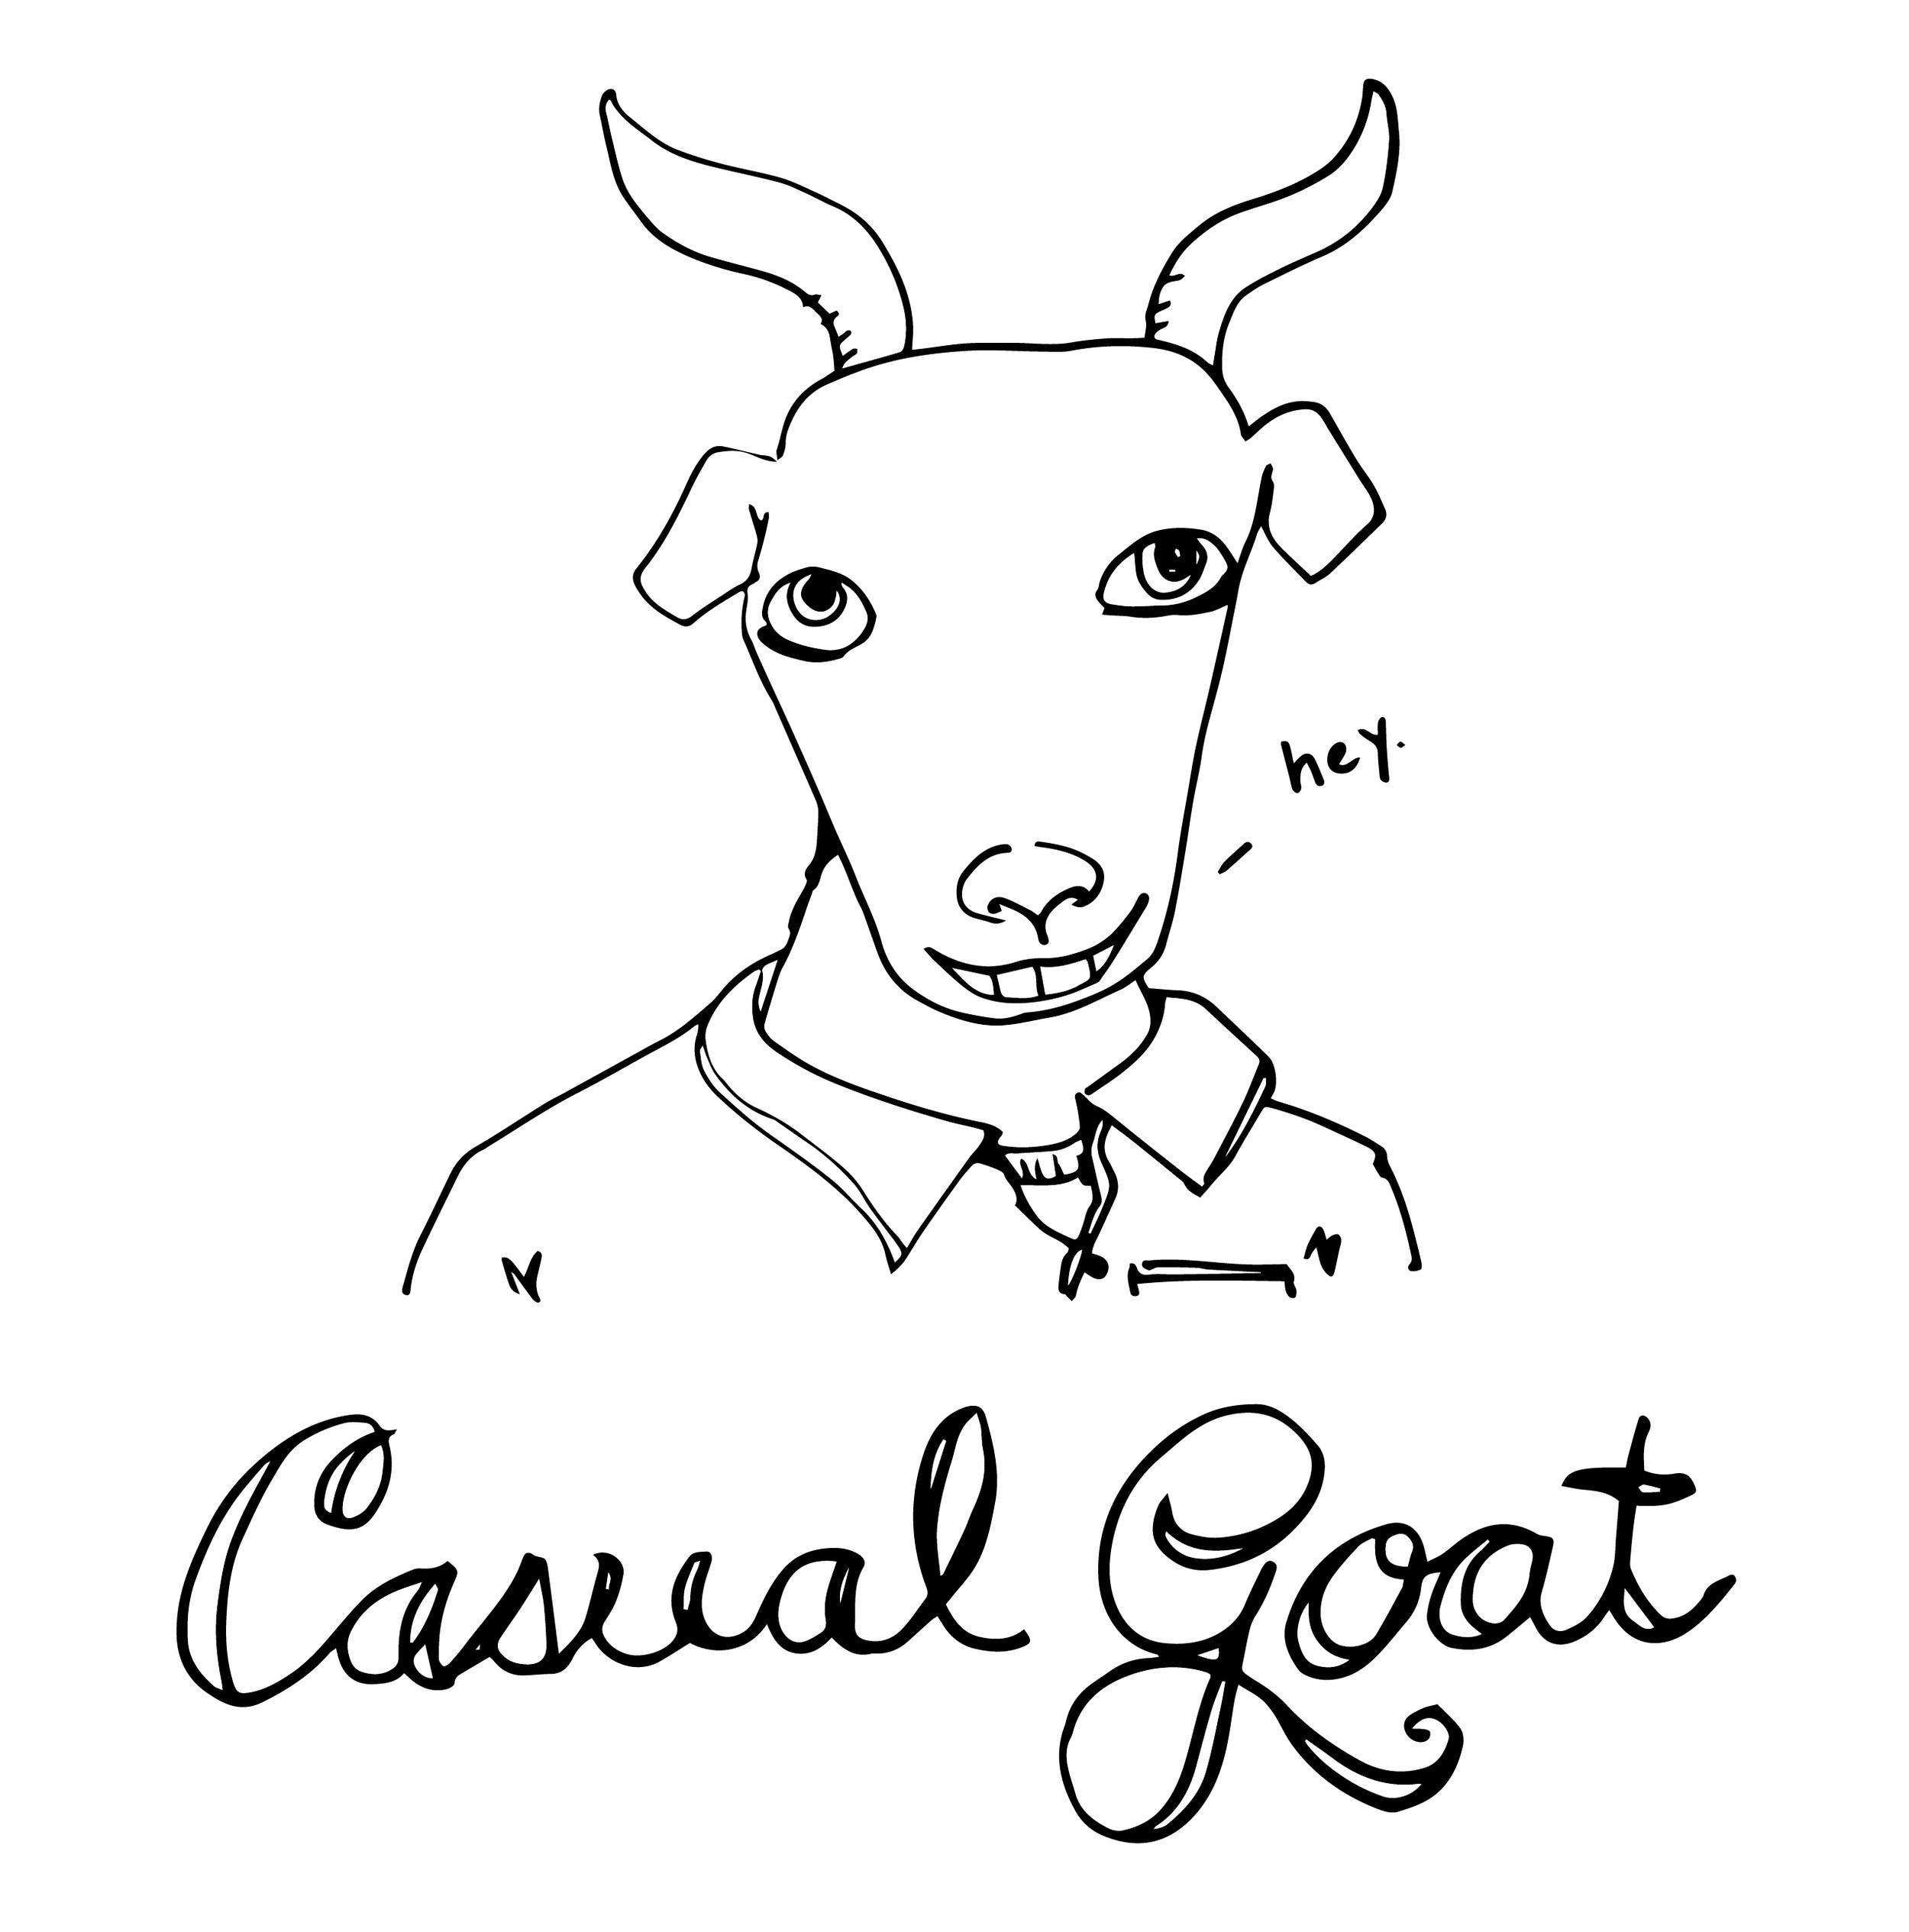 Casual Goat-01.jpg